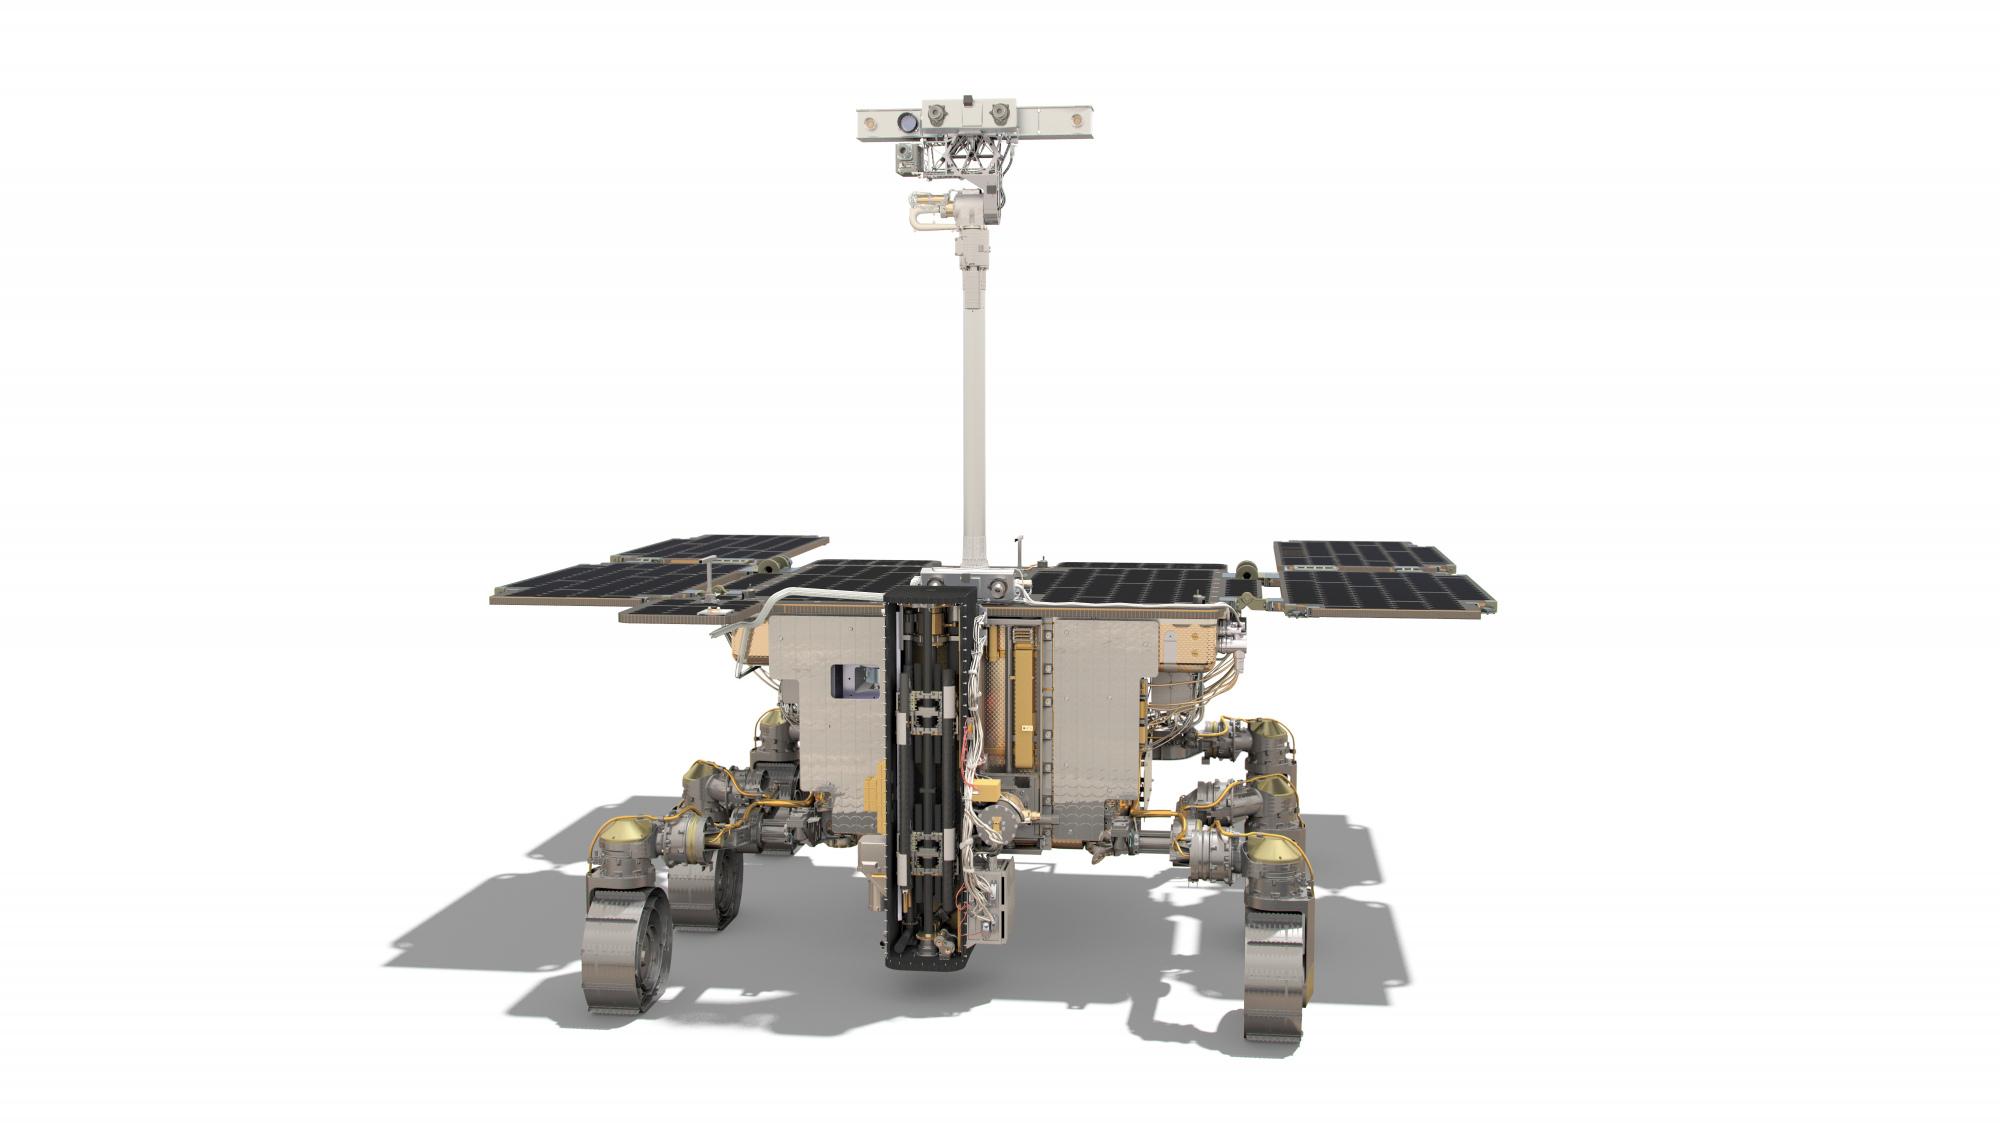 ExoMars2020_Rover_Drill_20170413_5_6k.thumb.jpg.496edfa0fe76ea43abc79dbea217d911.jpg